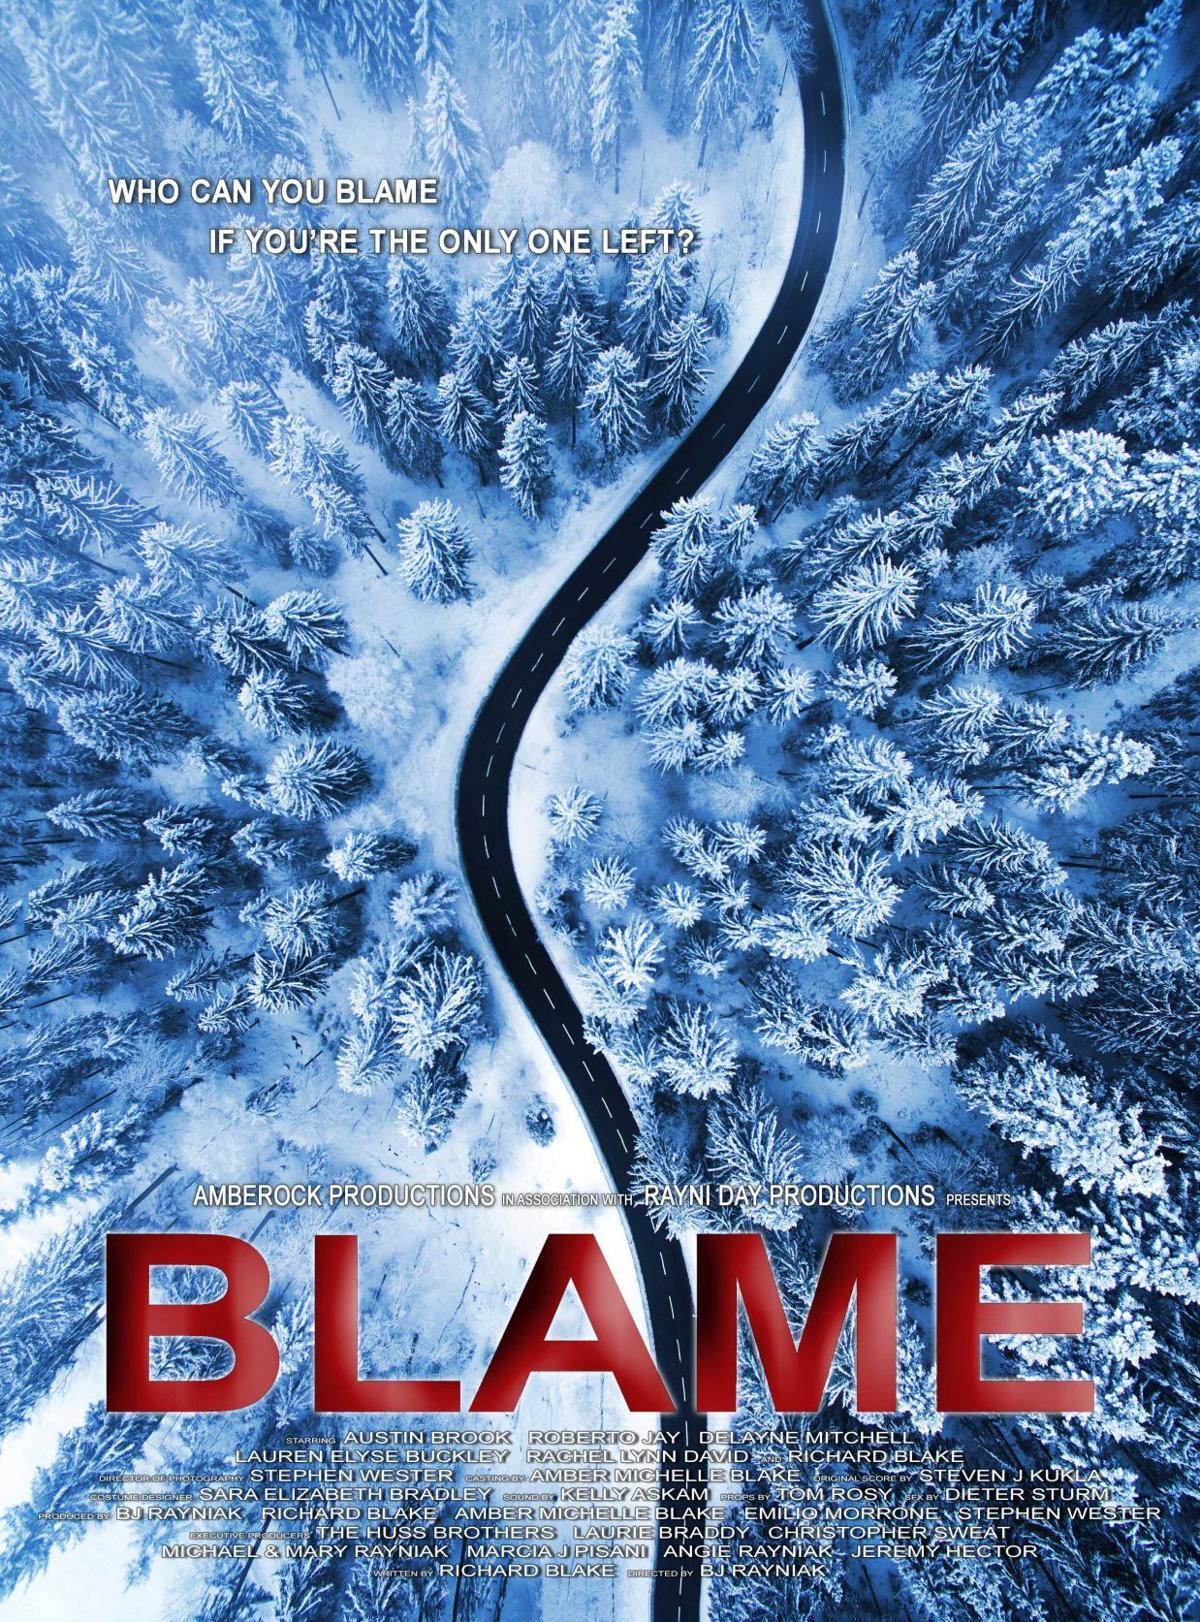 BLAME Road Poster 2021 (lo-res).jpg